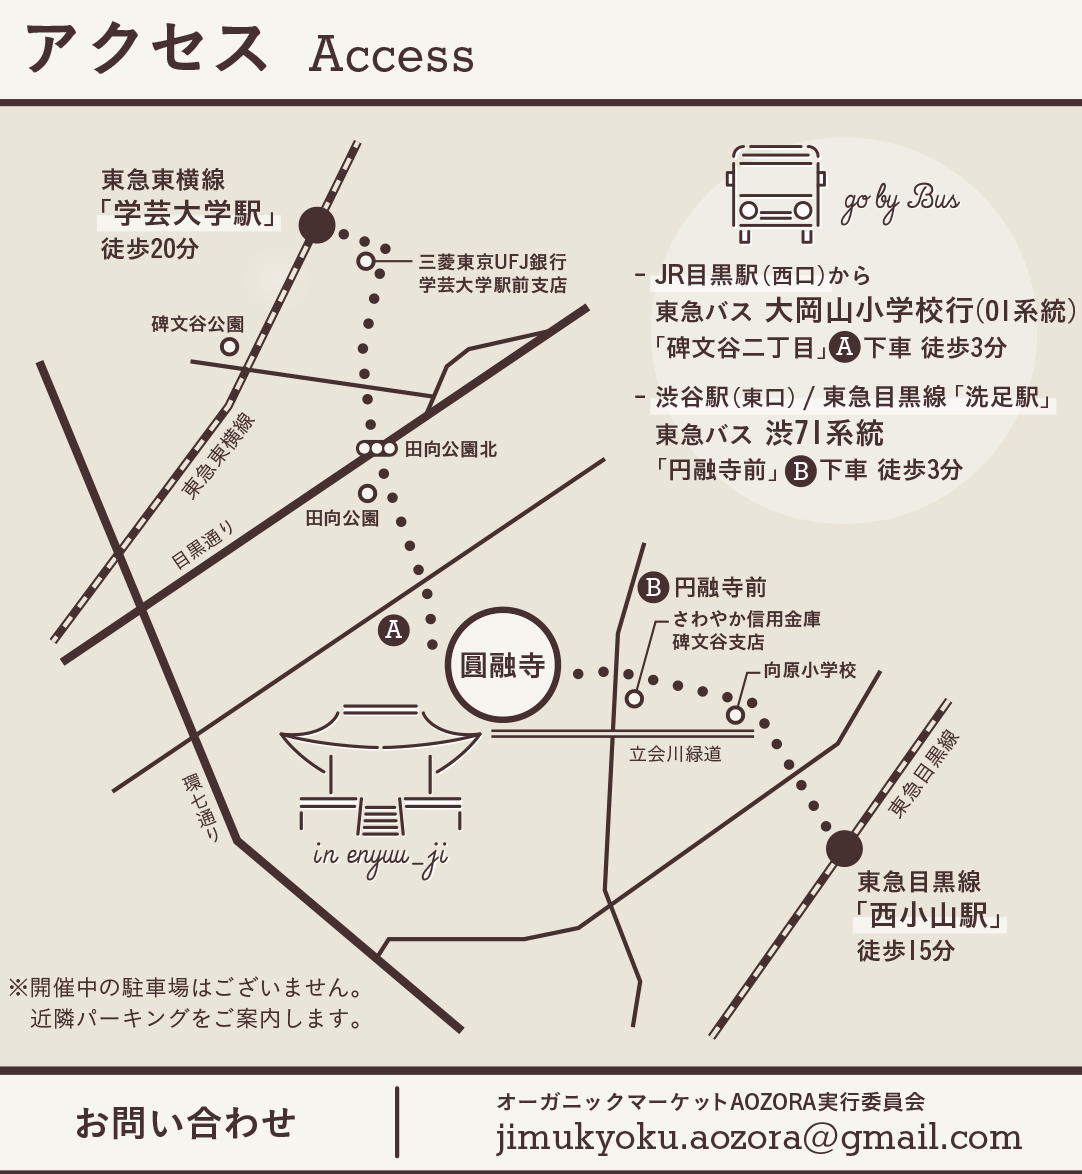 160406_aozoramarket_01_cs6